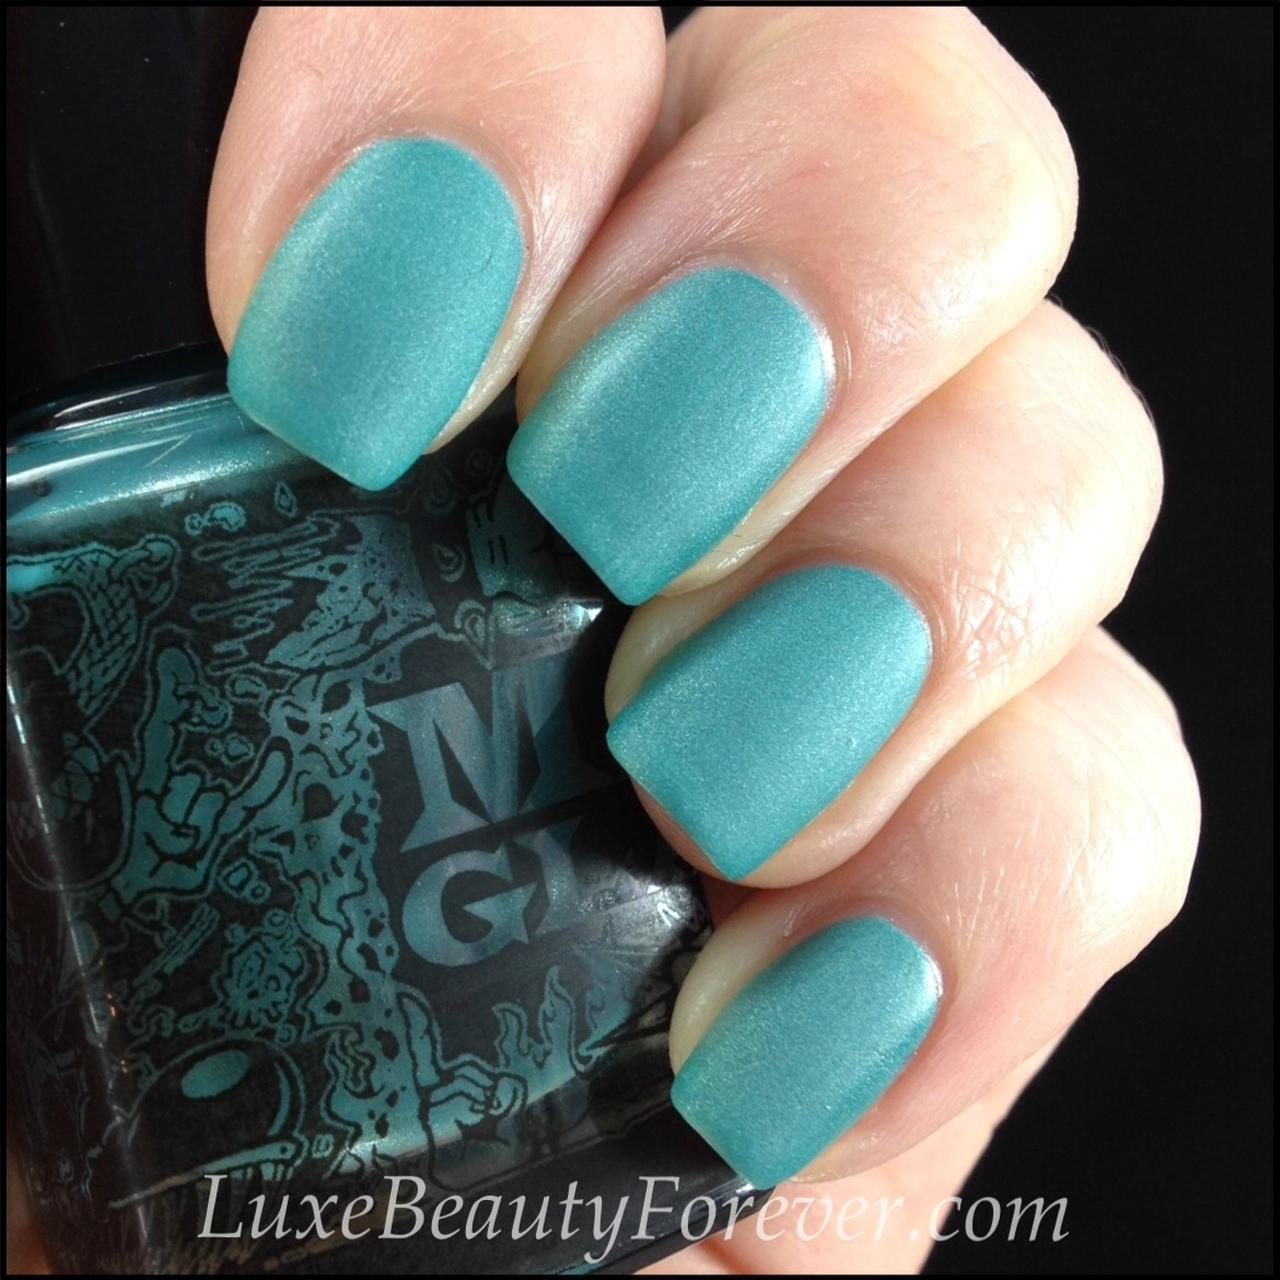 ManGlaze \'ILF\' Matte Nail Polish | Luxe Beauty Forever